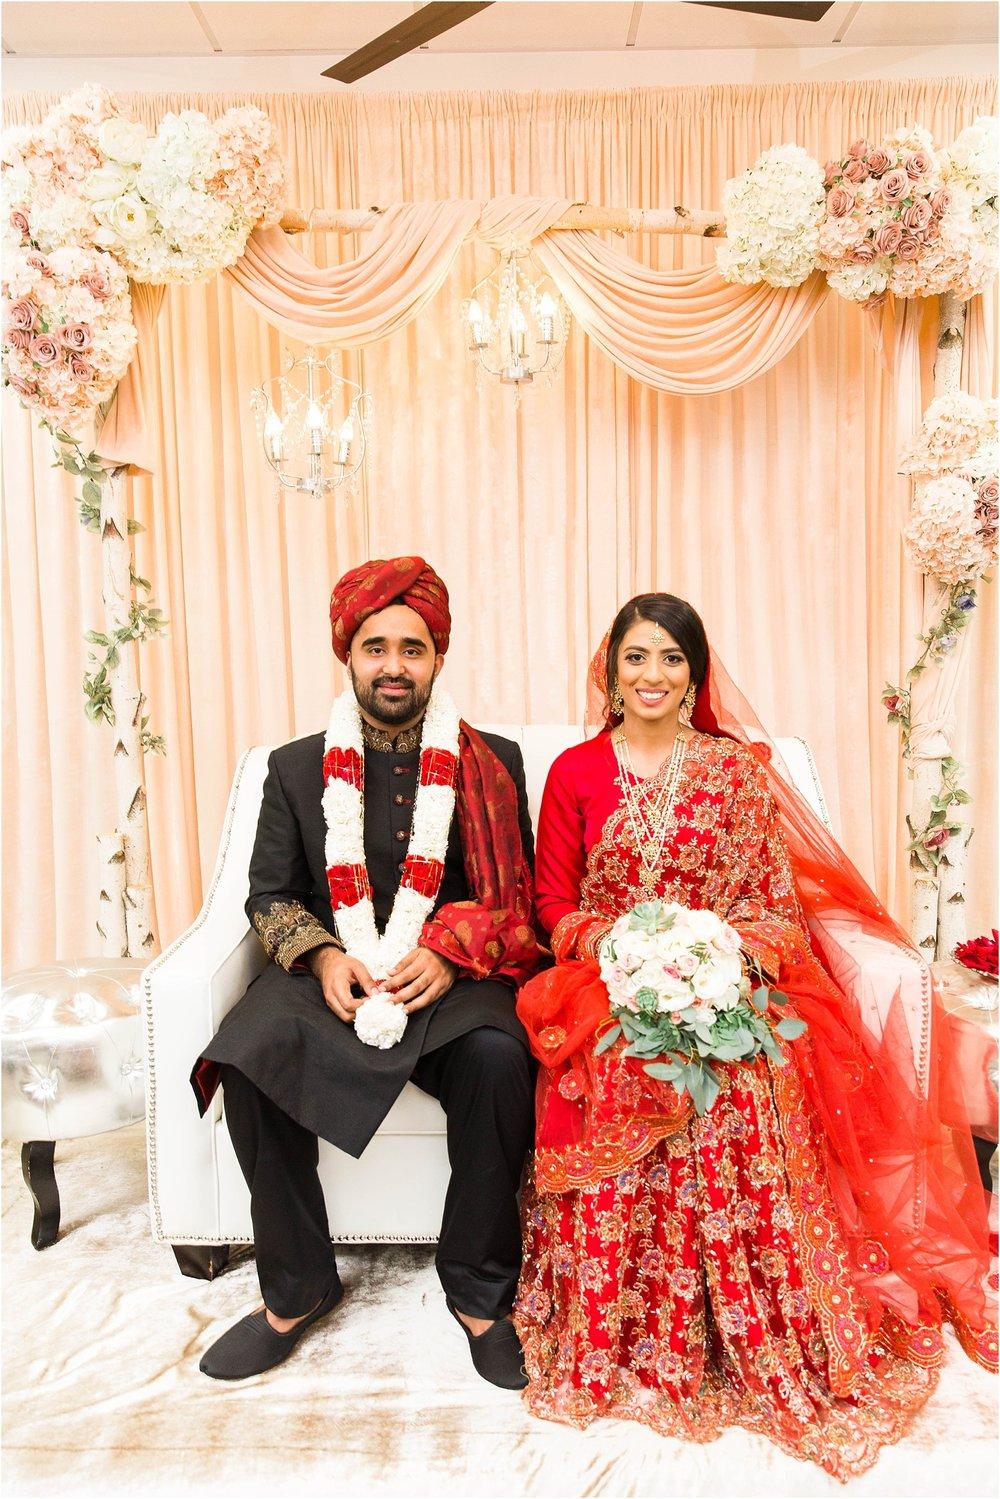 Jame-Masjid-Coopers-Mosque-Kariya-Park-Cherry-Blossoms-Wedding-Toronto-Mississauga-Brampton-Scarborough-GTA-Pakistani-Indian-Wedding-Engagement-Photographer-Photography_0039.jpg